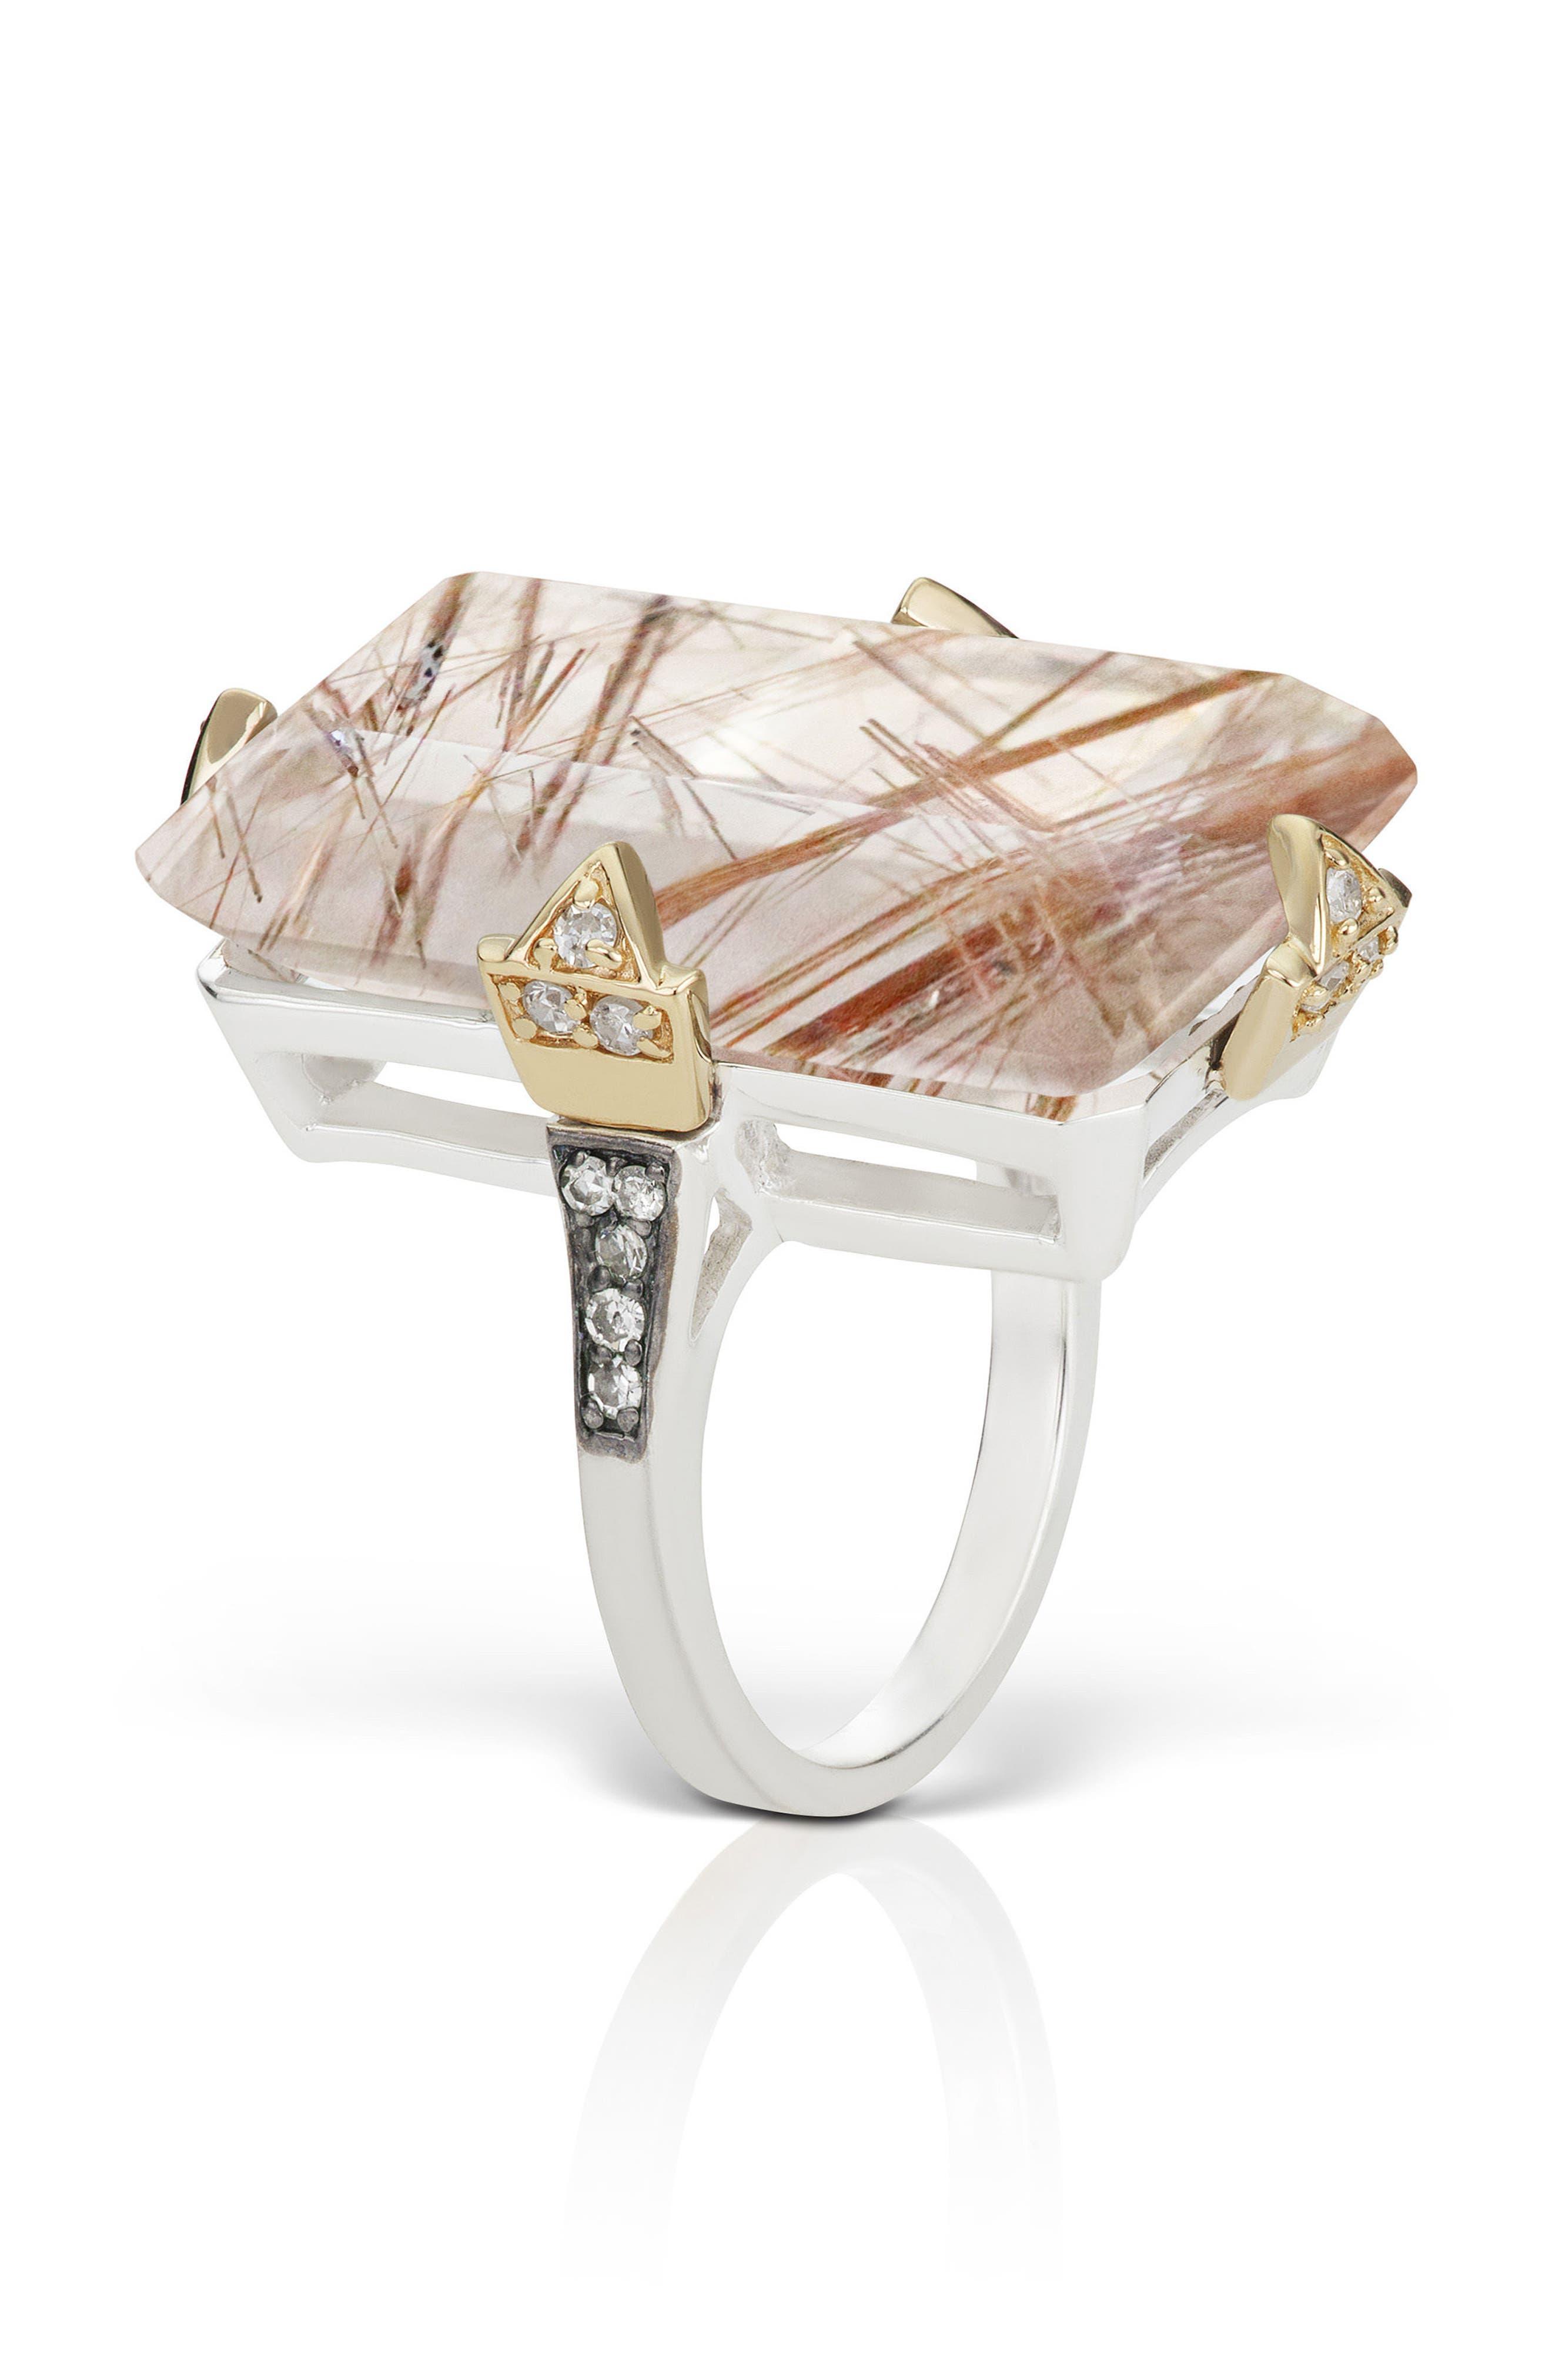 Phenomena Quartz and Diamond Cocktail Ring,                             Alternate thumbnail 5, color,                             Rutilated Quartz